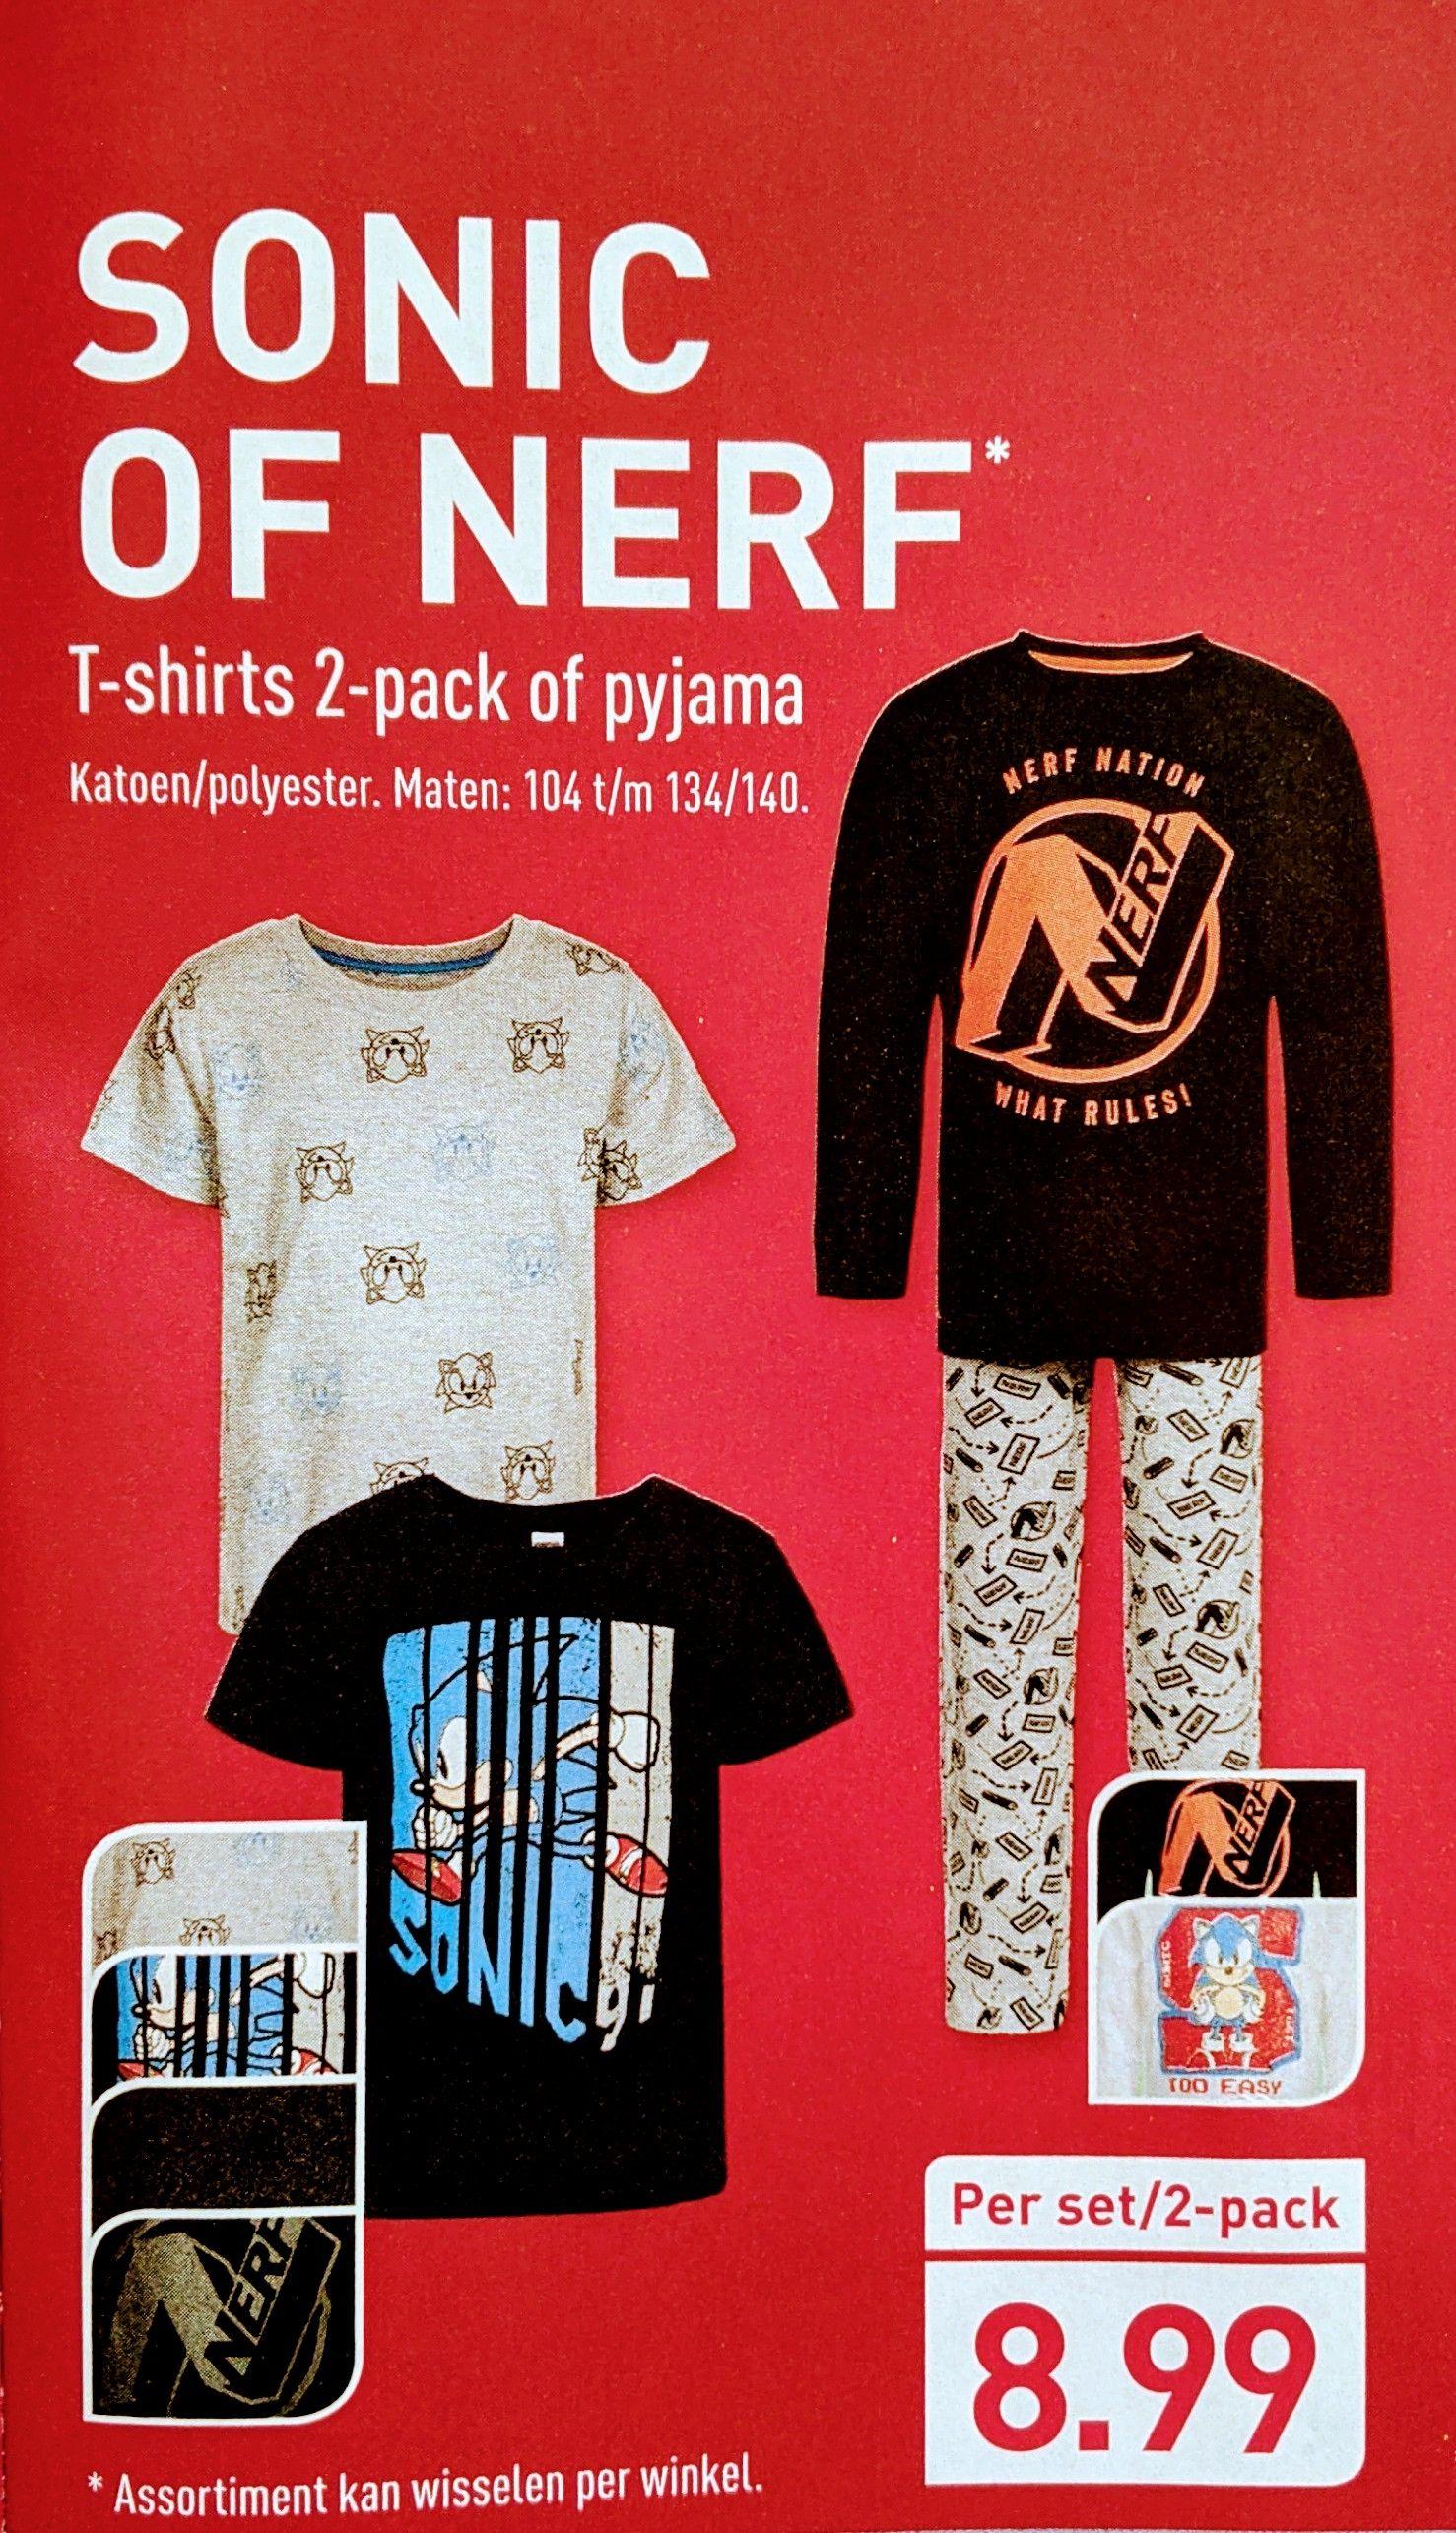 SONIC OF NERF T-shirts 2-pack of pyjama Katoen/polyester. Maten: 104 t/m 134/140. Aldi van af 10-10-2020